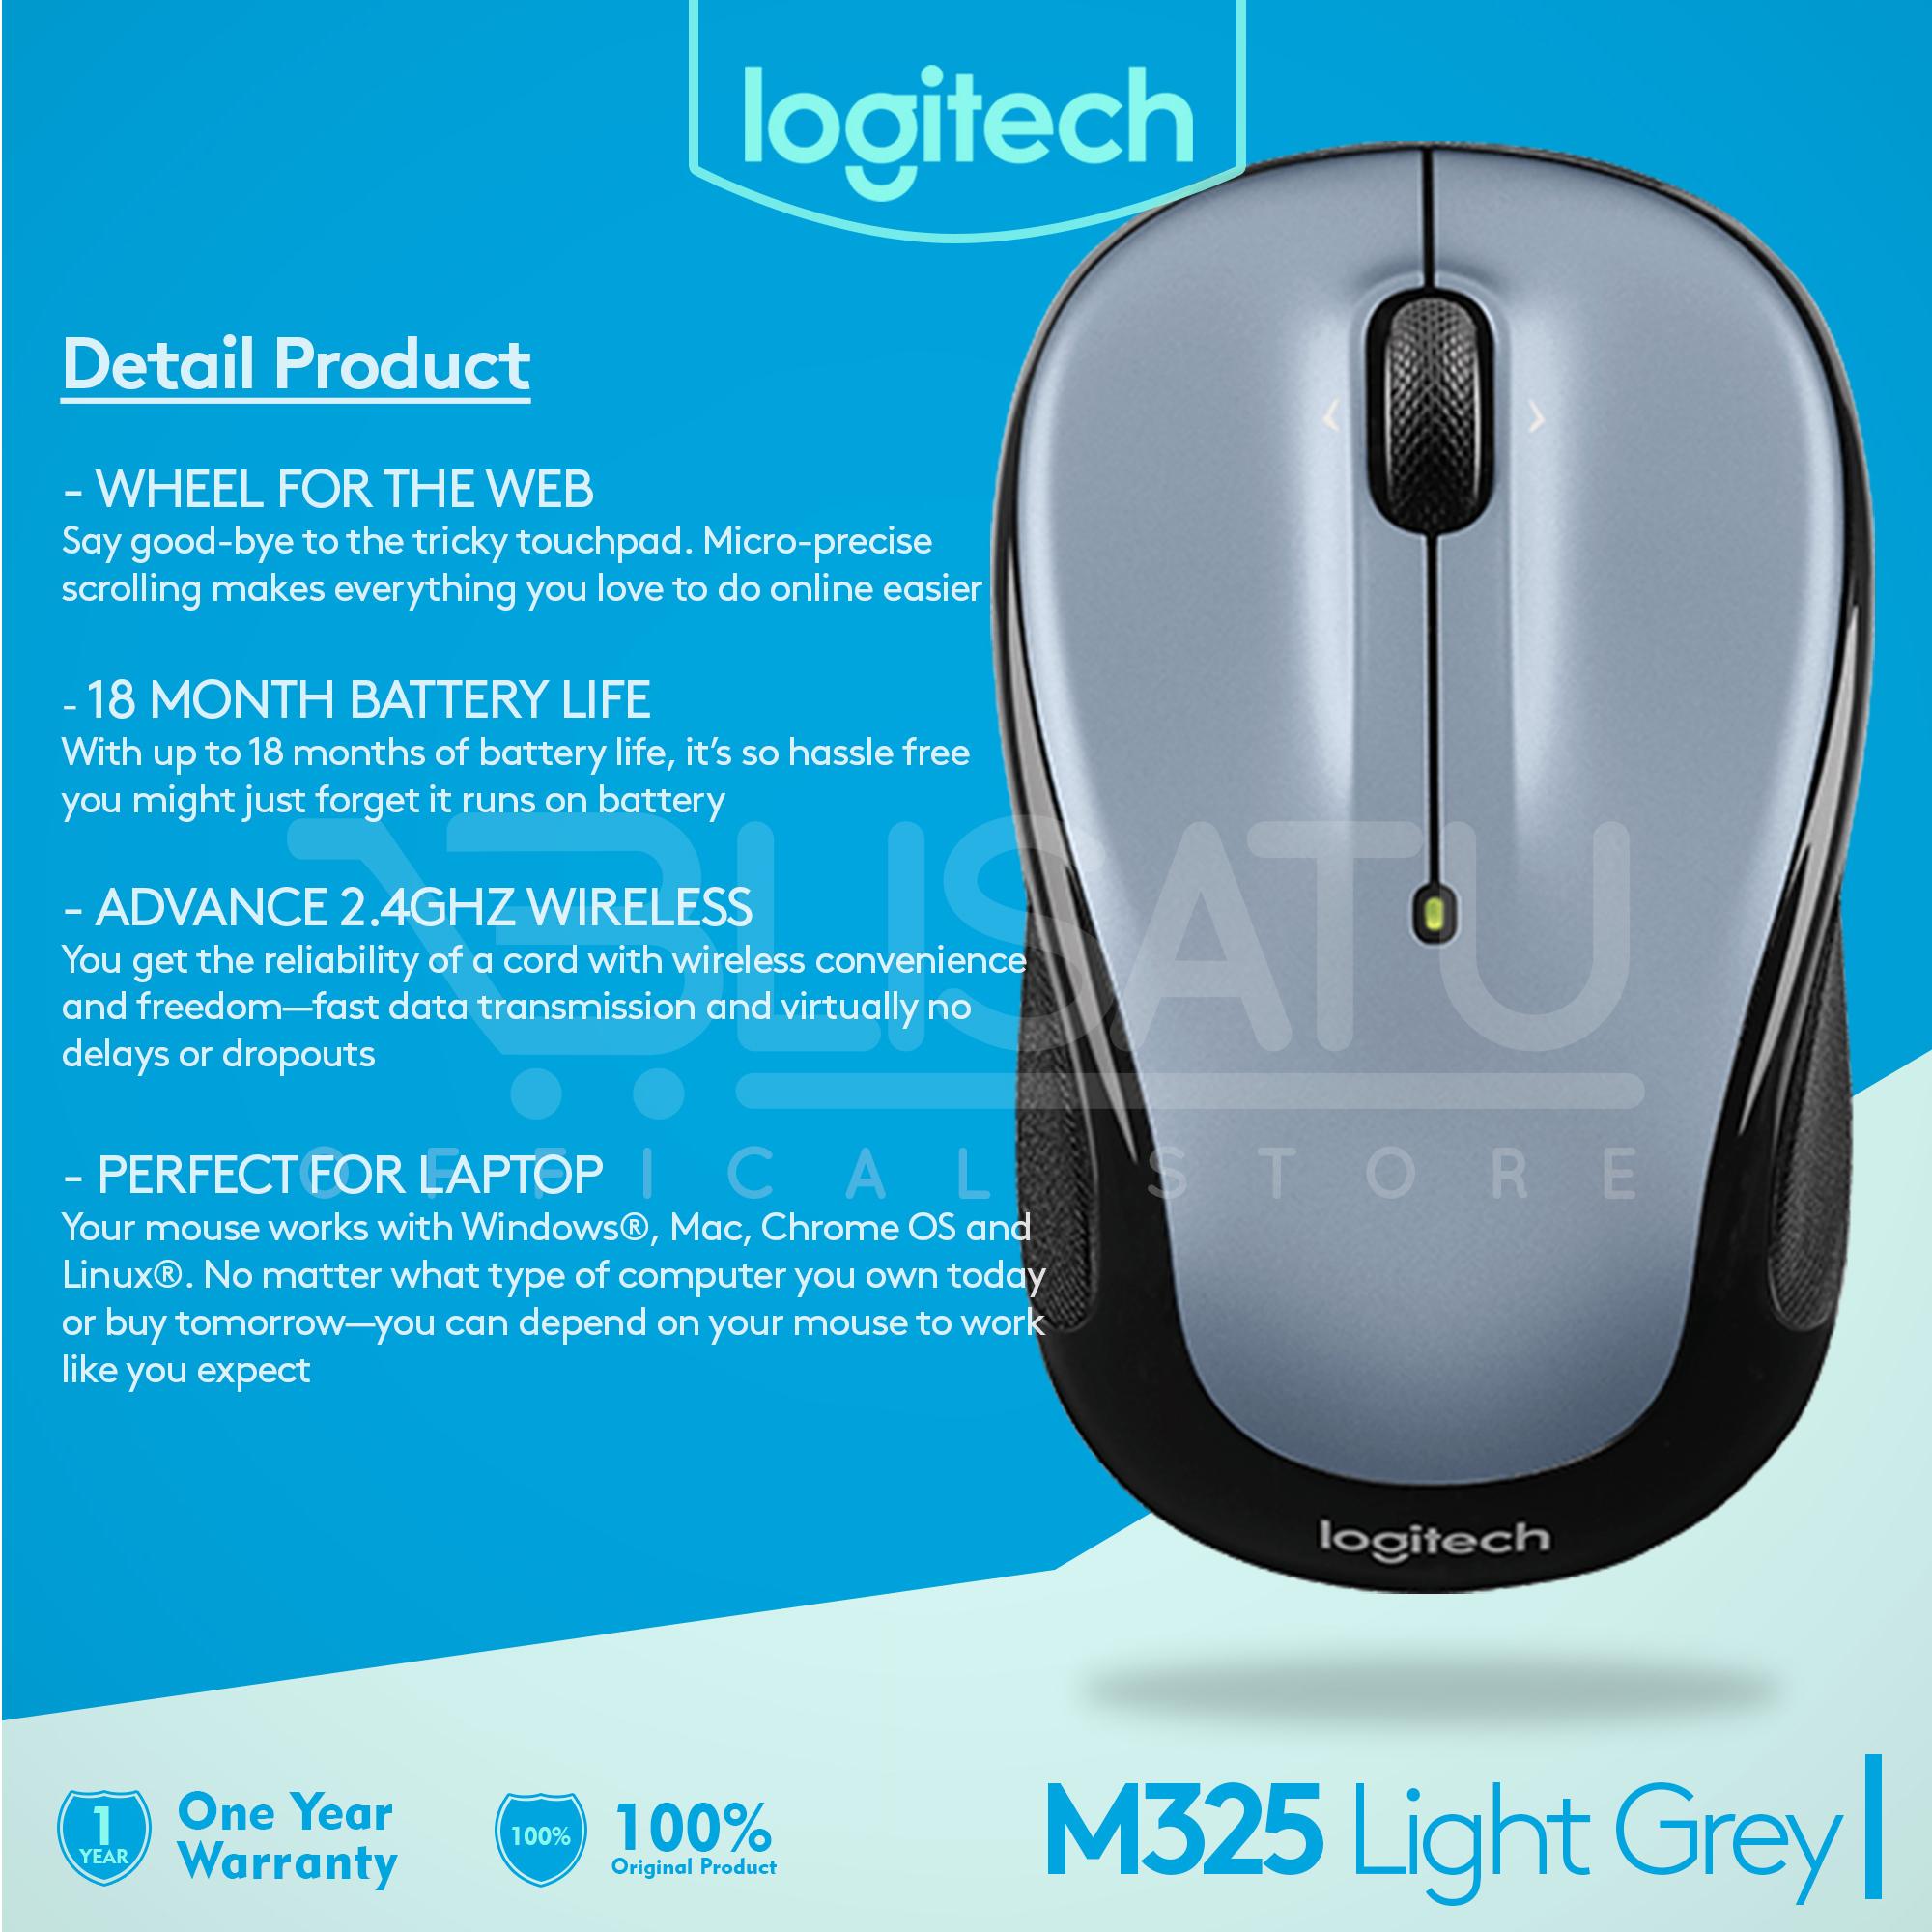 Logitech Wireless Mouse M325 Light Grey